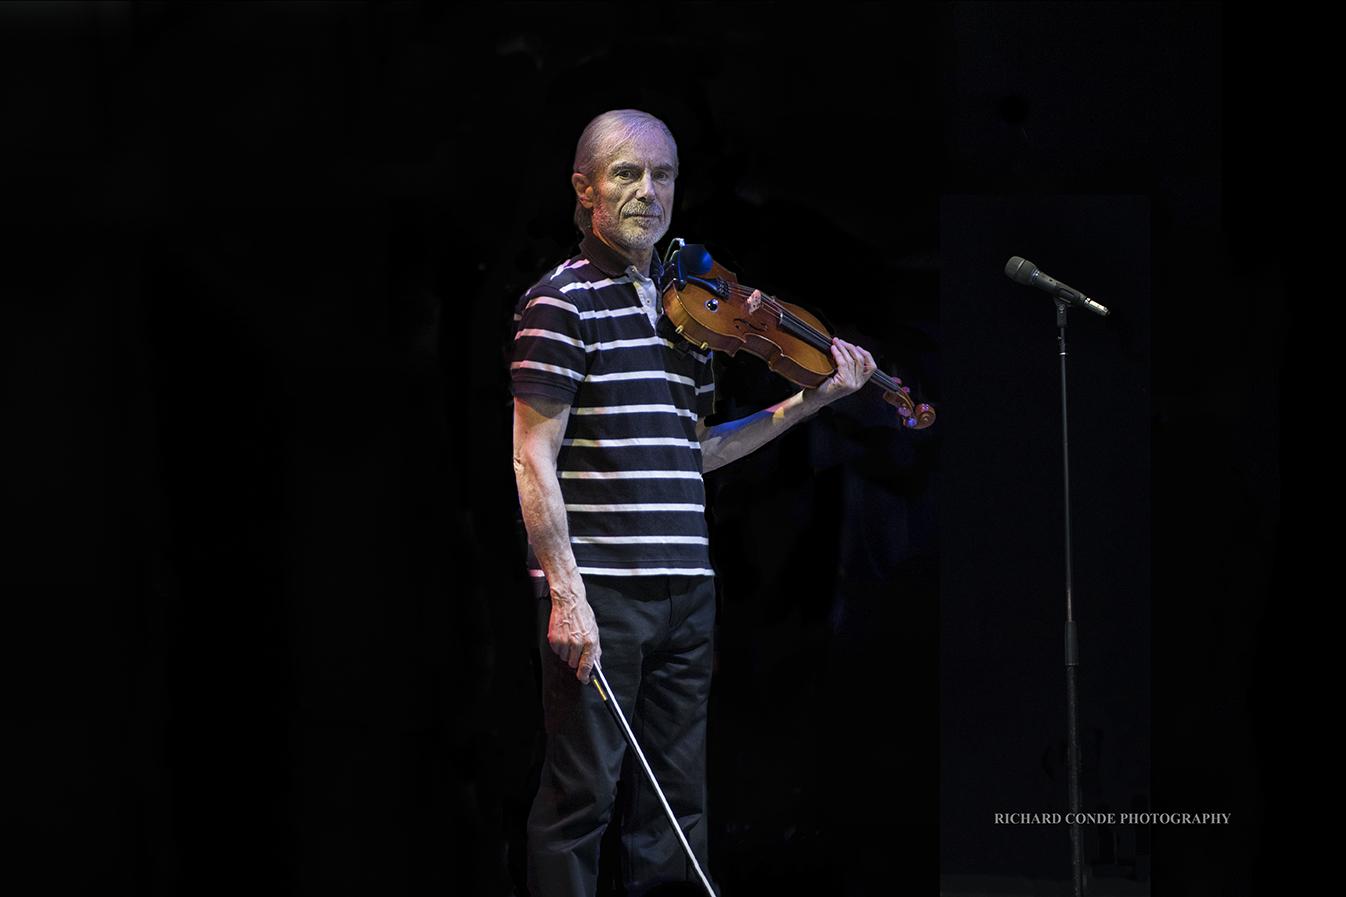 Jean Luc Ponty at the Freihofer Saratoga Jazz Festival 2017